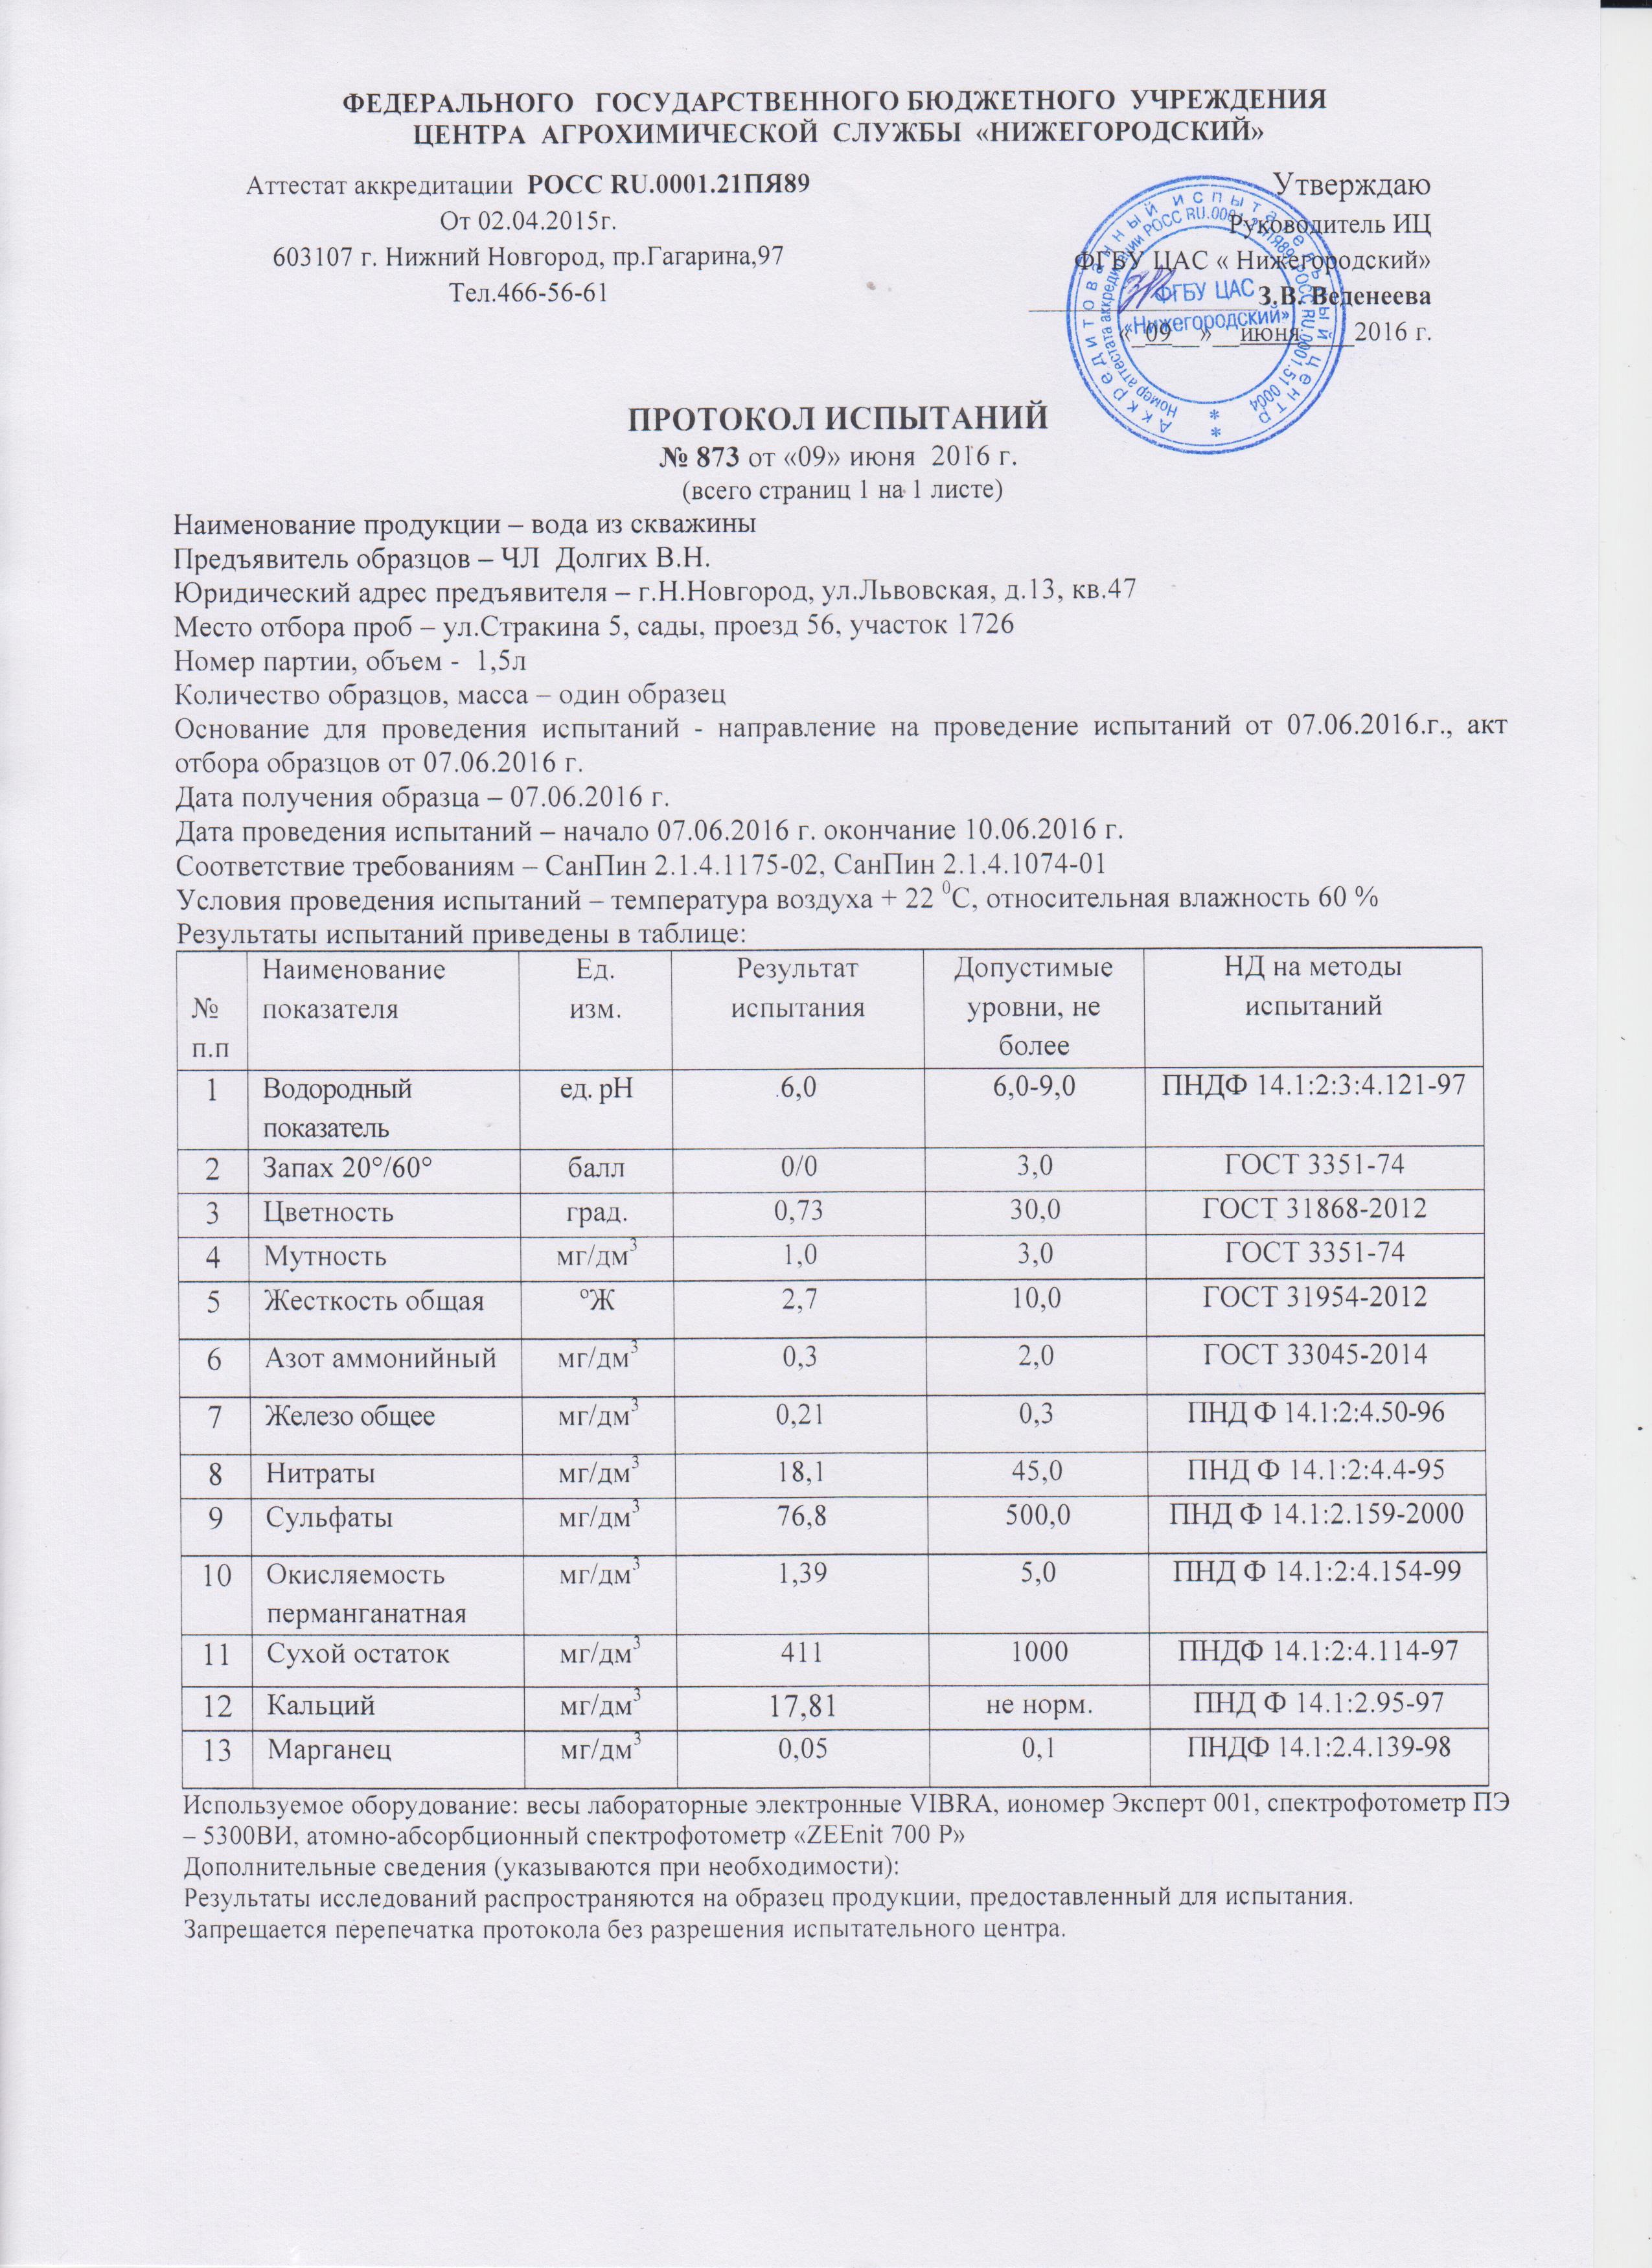 ��� ���������52  �������� ��������� , ������������ ��������� -���� �� �������� burenienikolai.www.nn.ru , ��������� � ���� +7(831)291-12-13